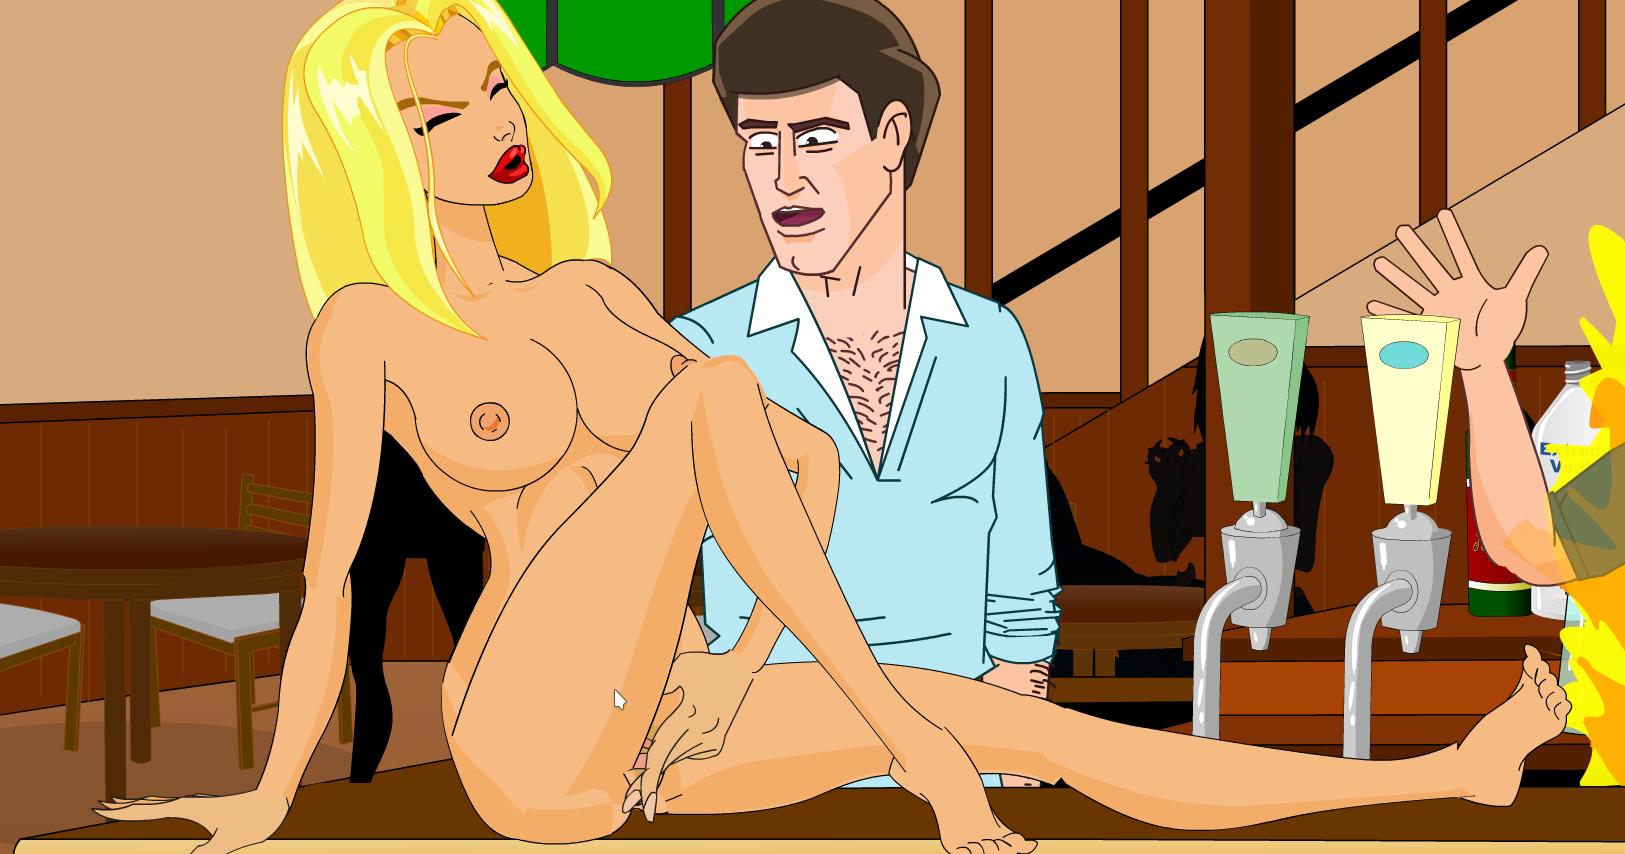 flesh-erotika